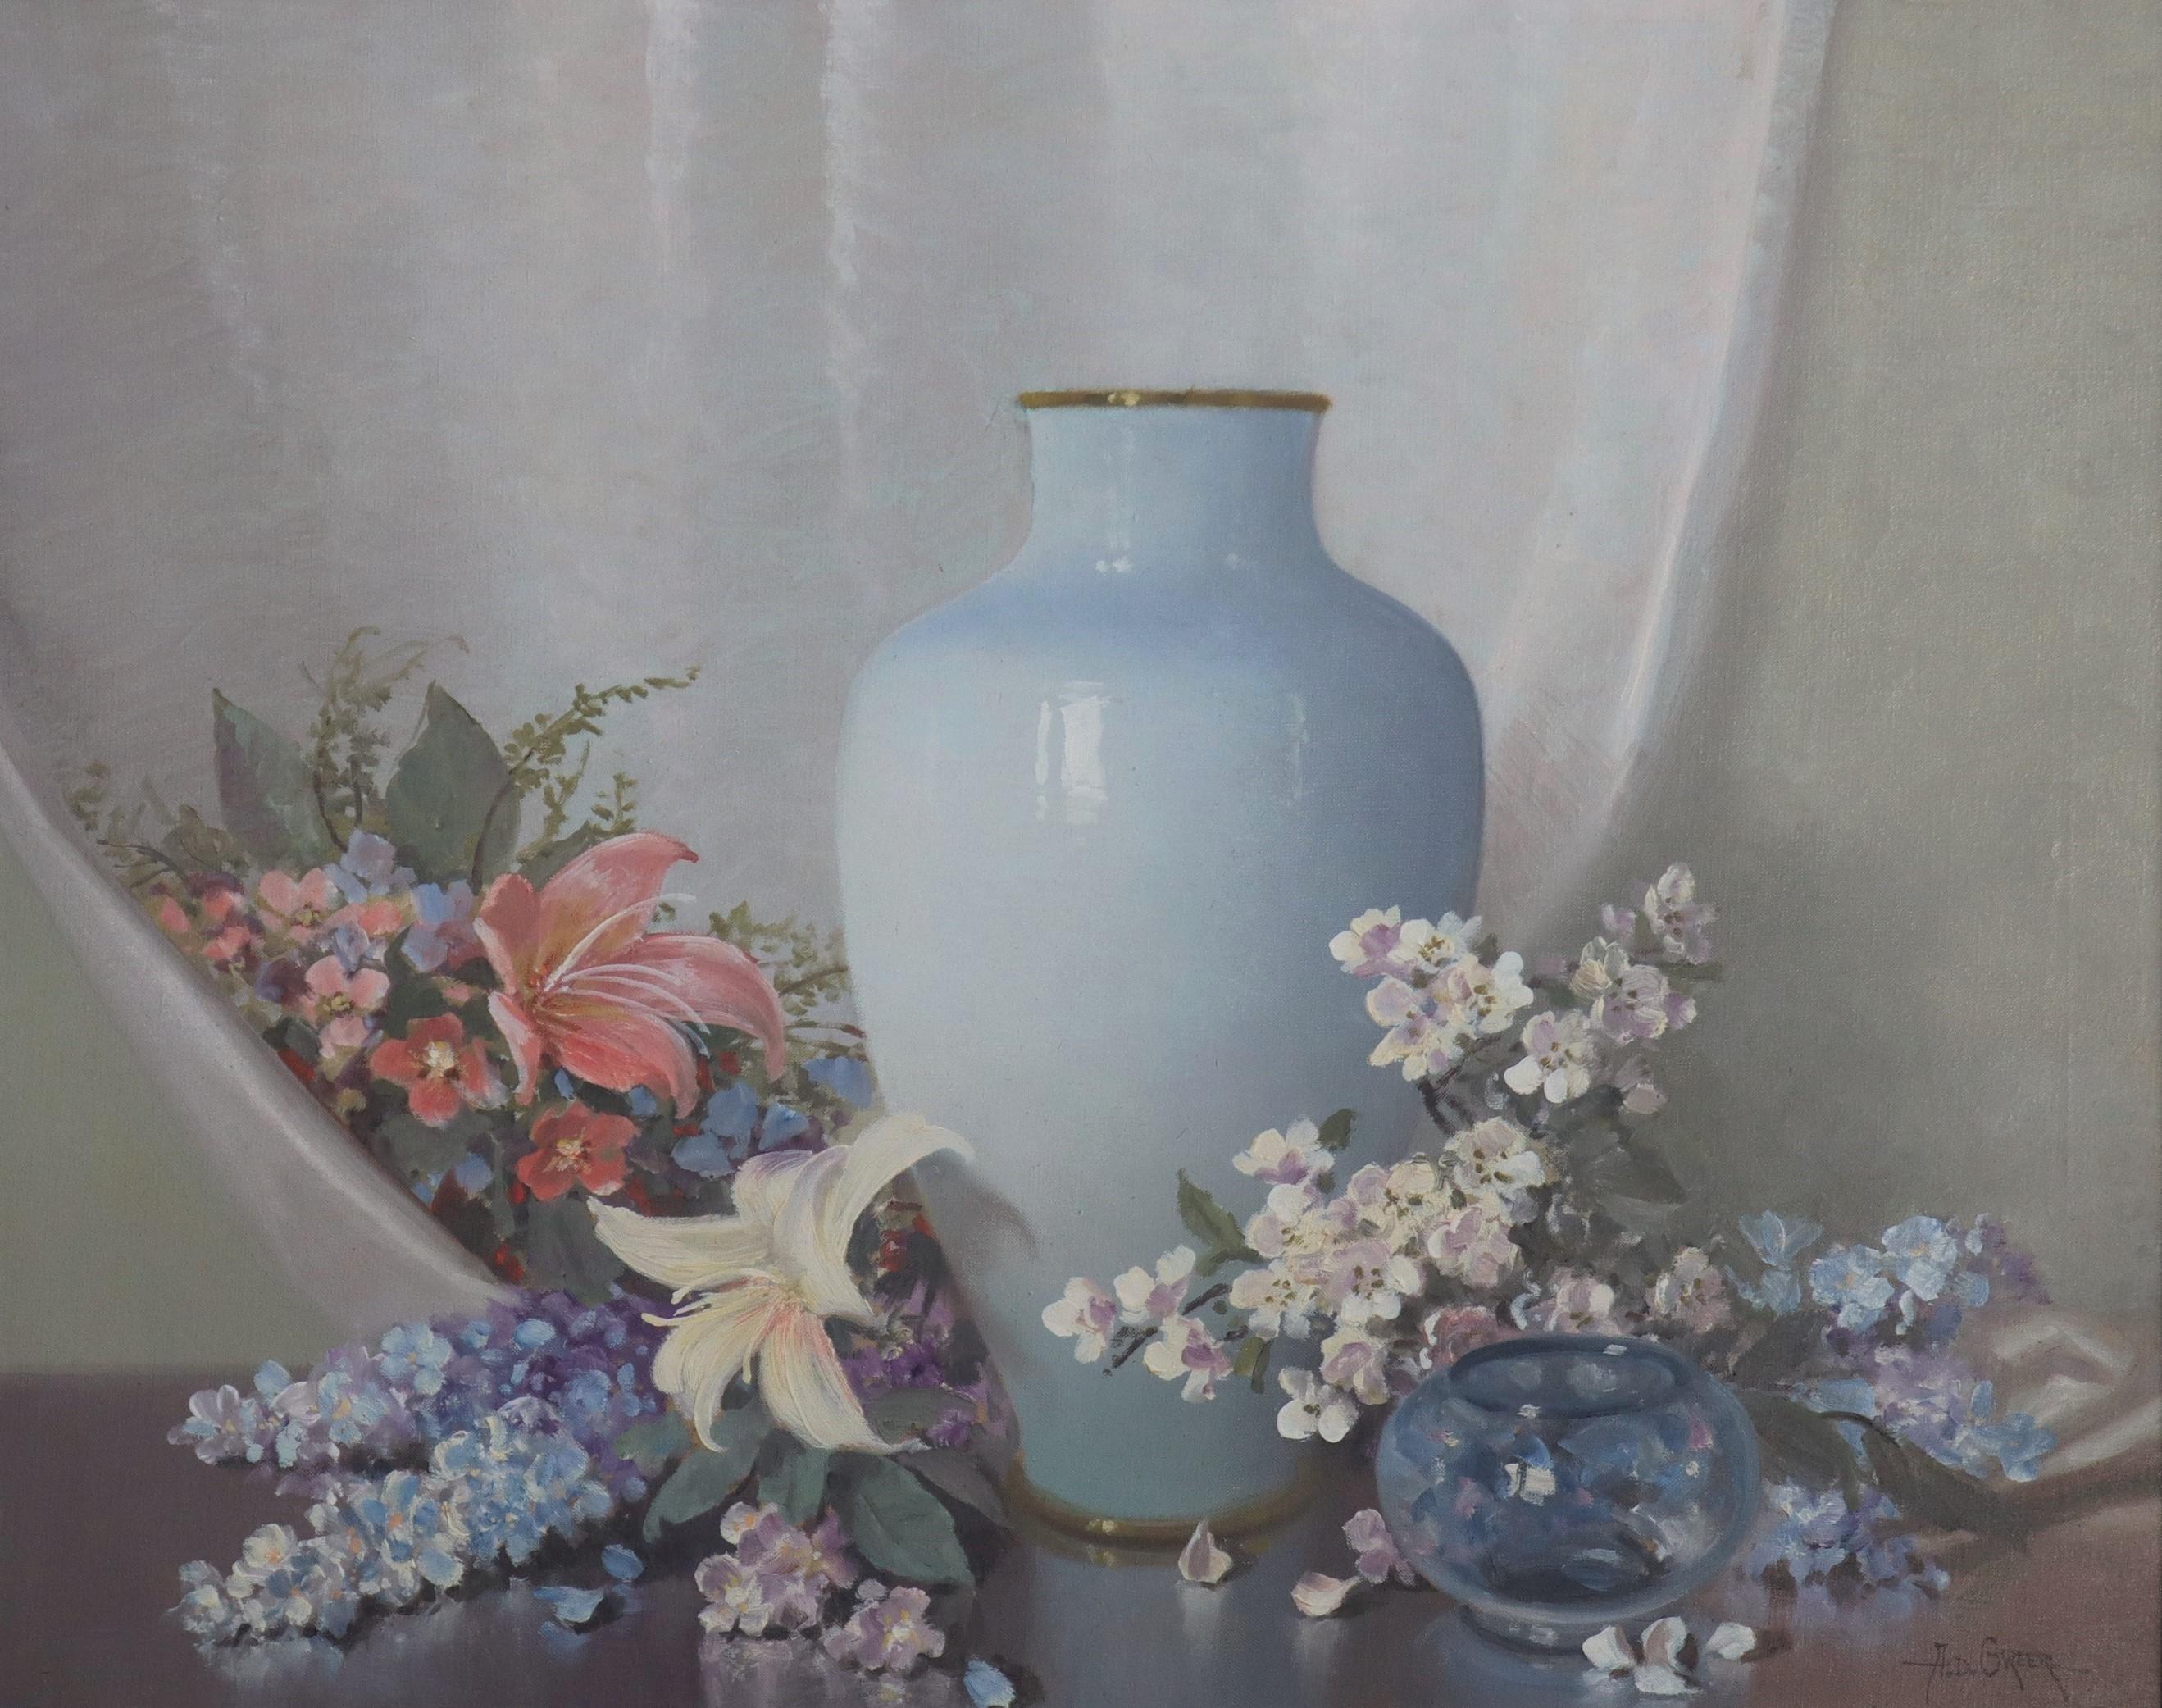 Floral Still-life with Light Blue Vase